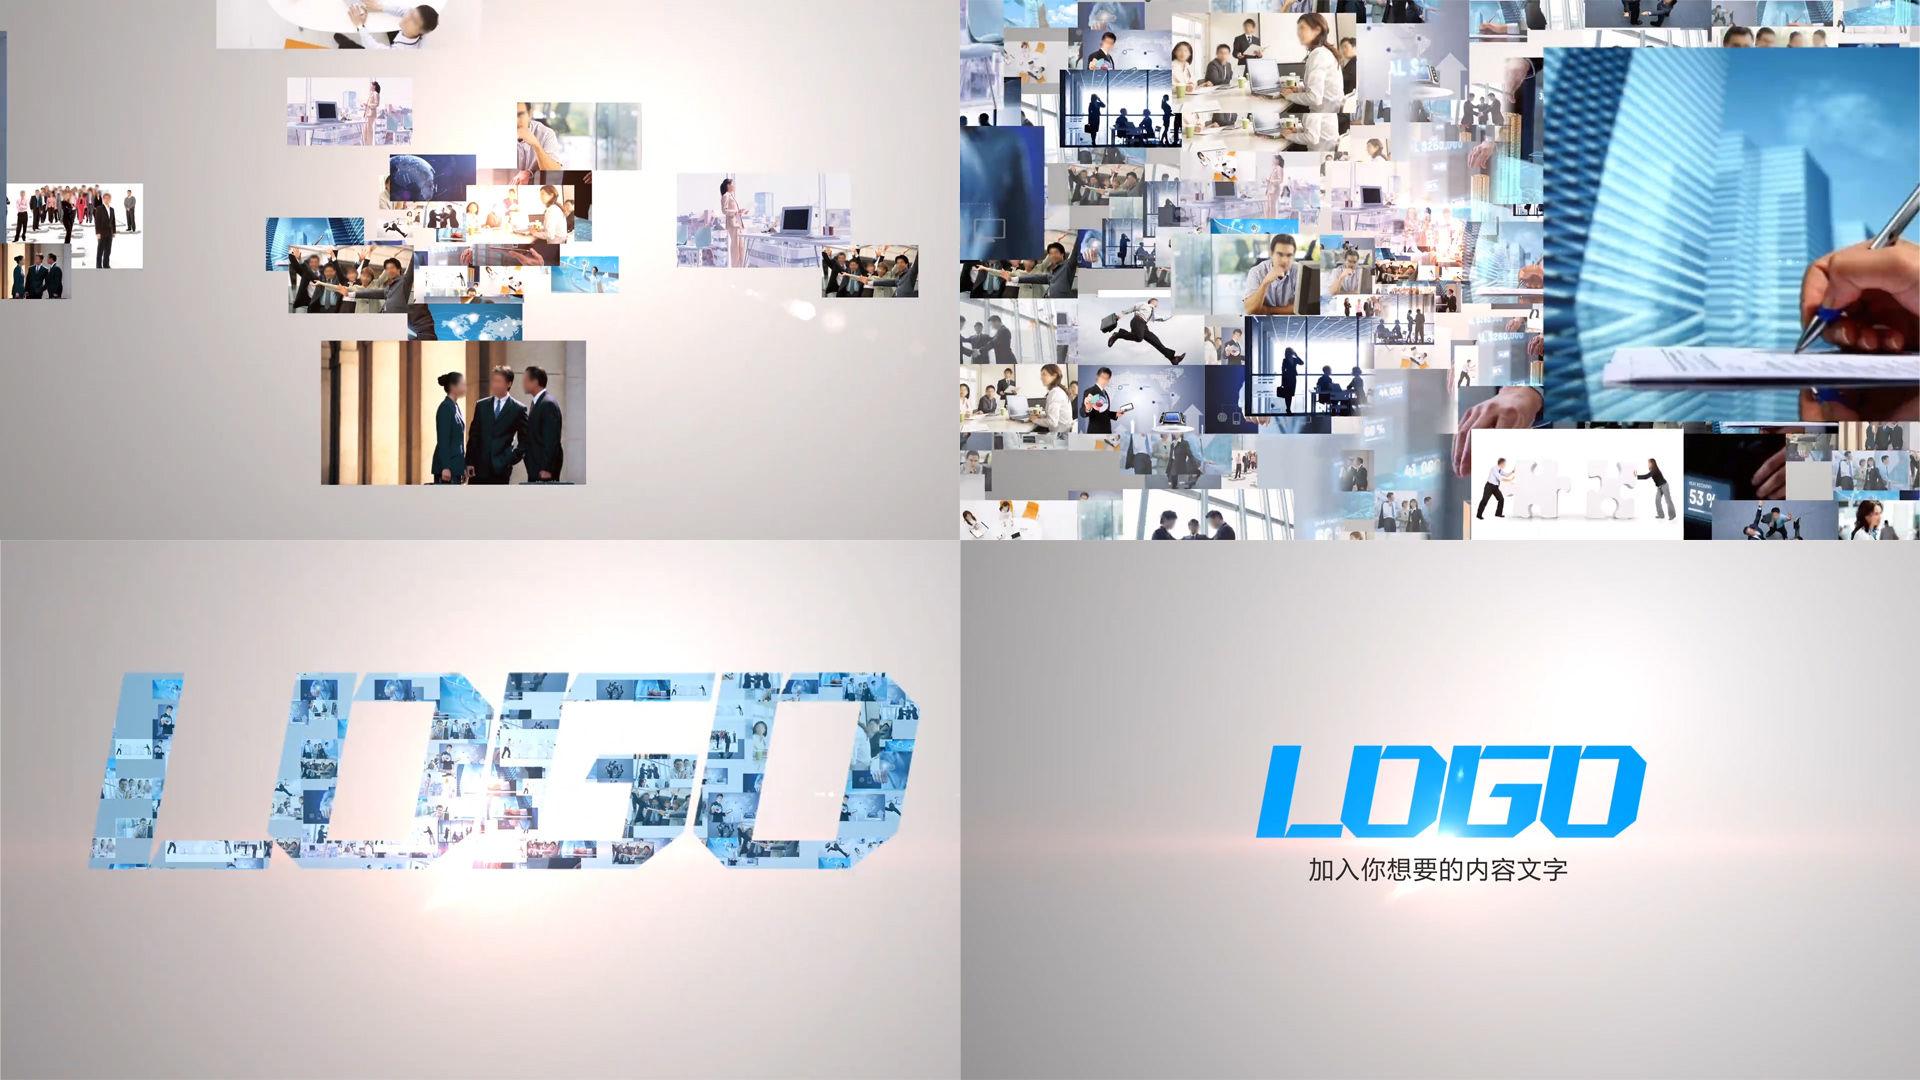 企业照片汇聚logo